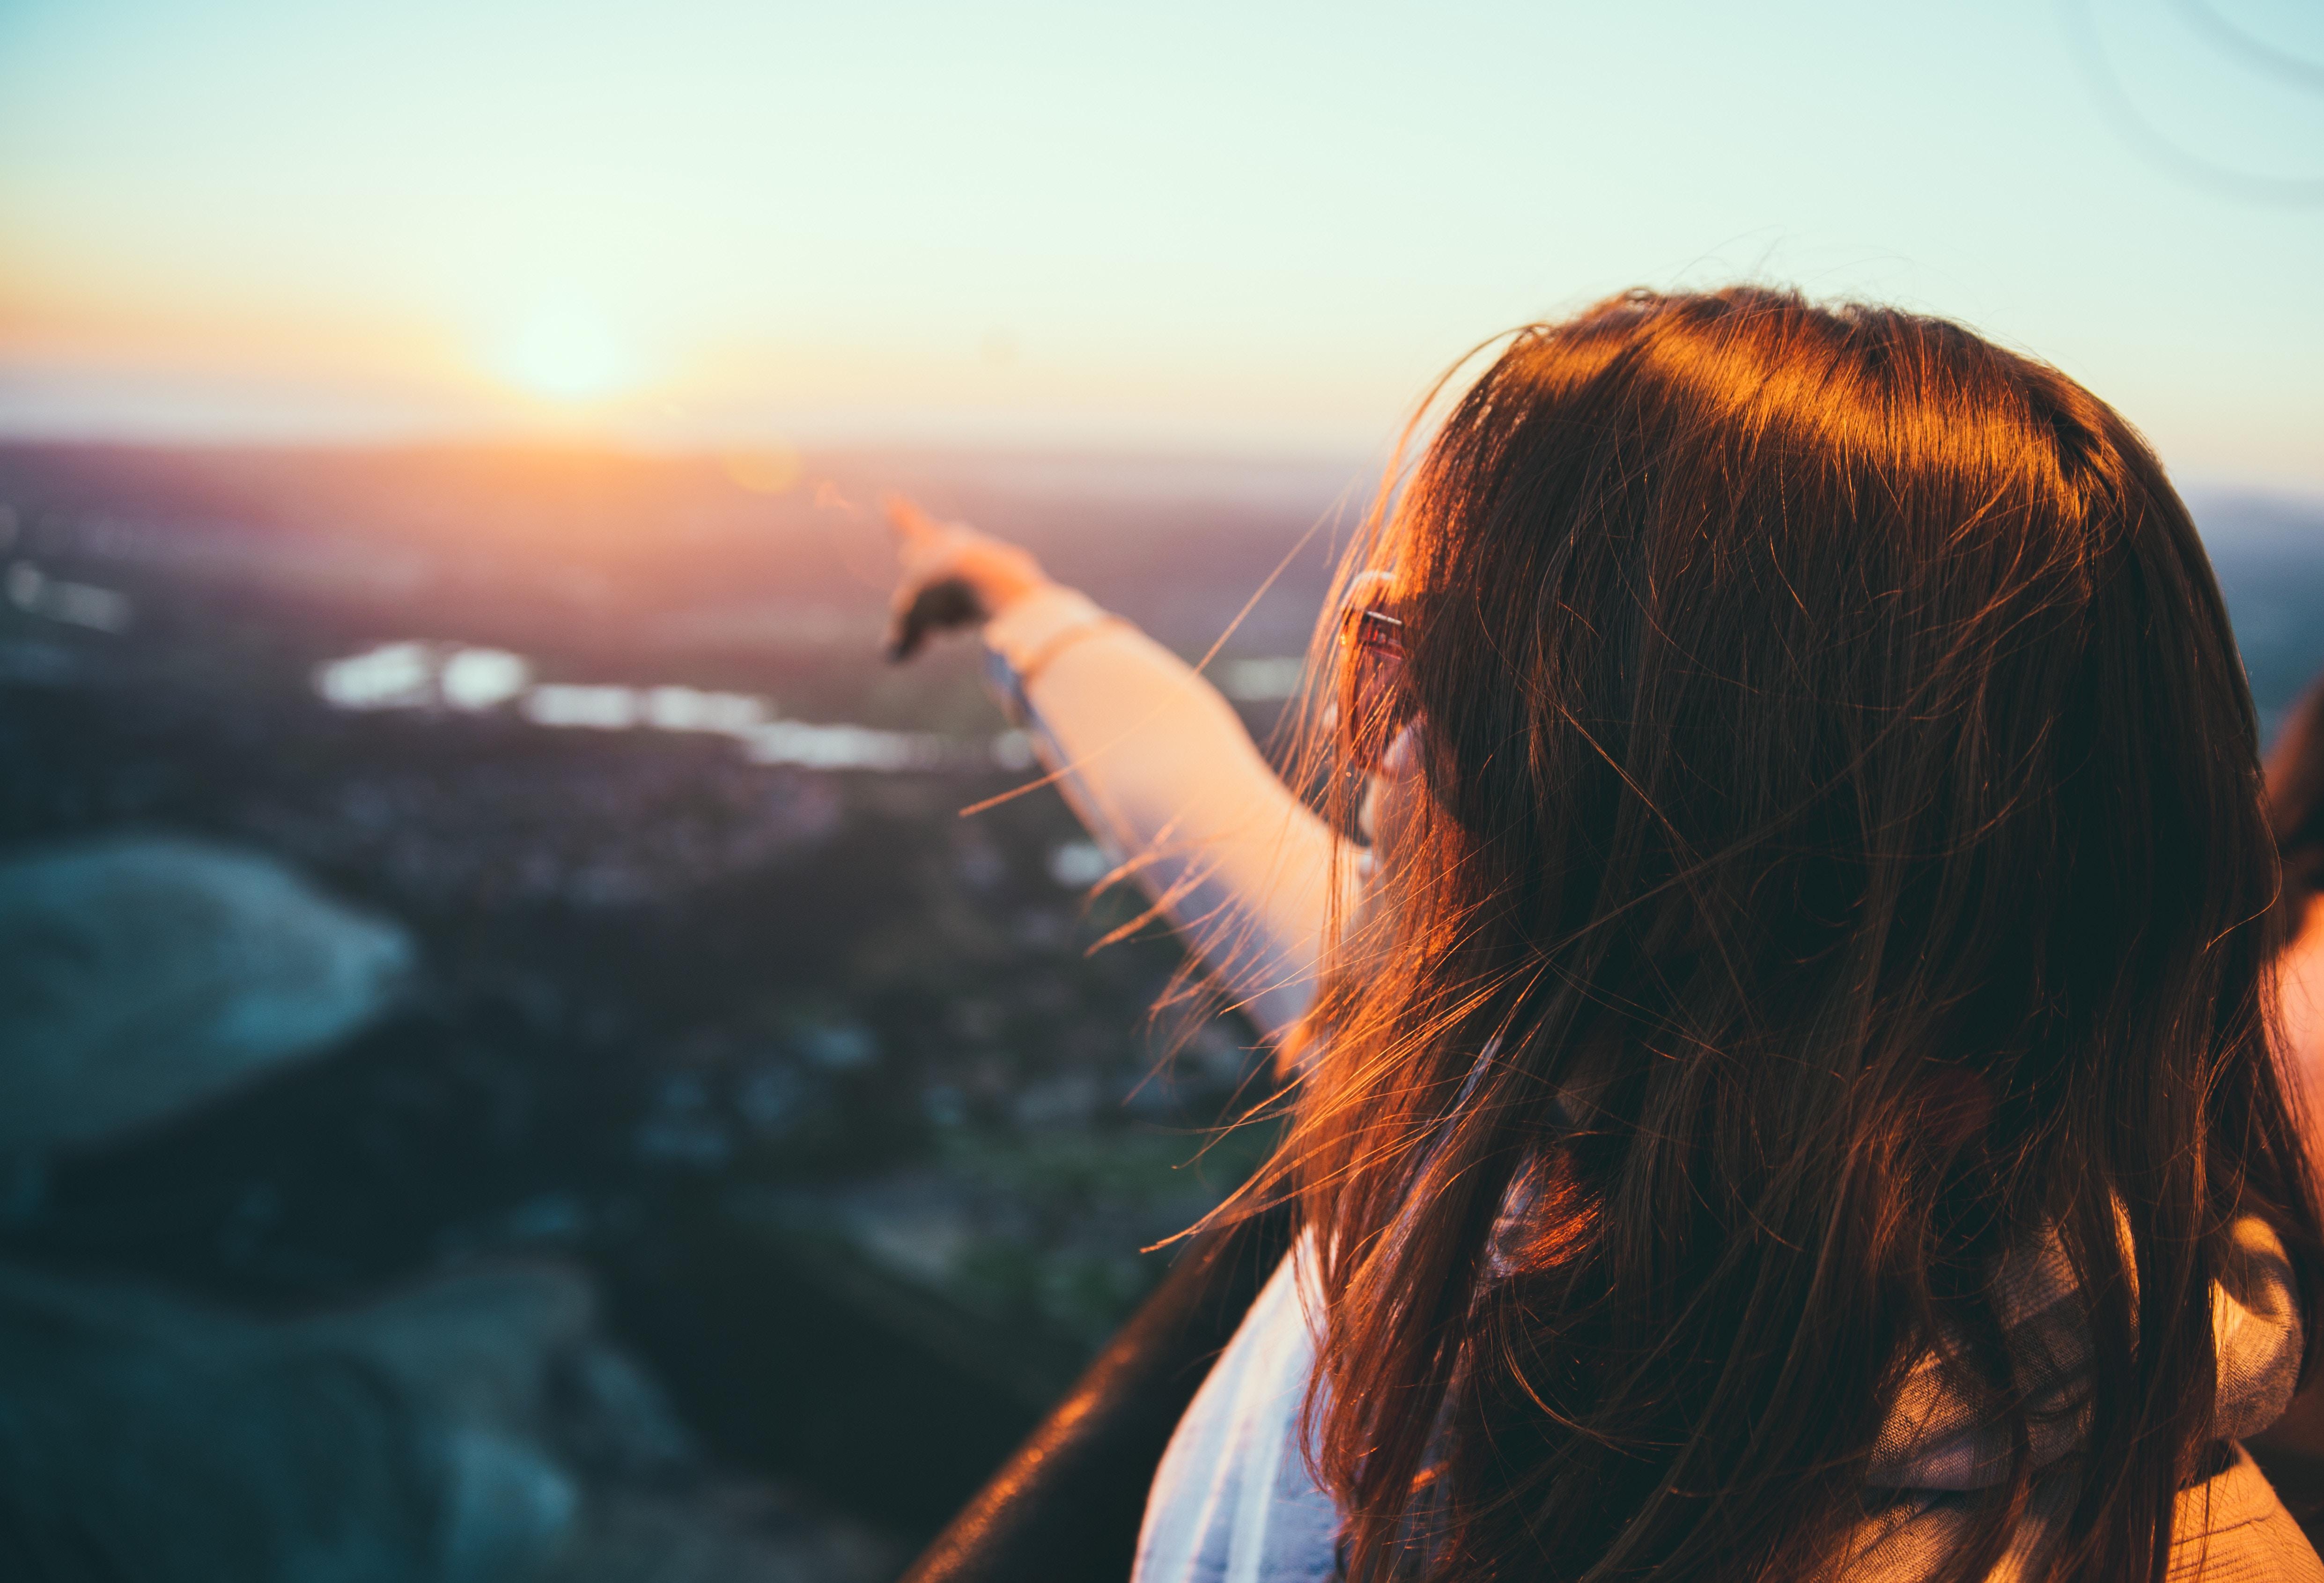 Днем, картинки девушка и солнце